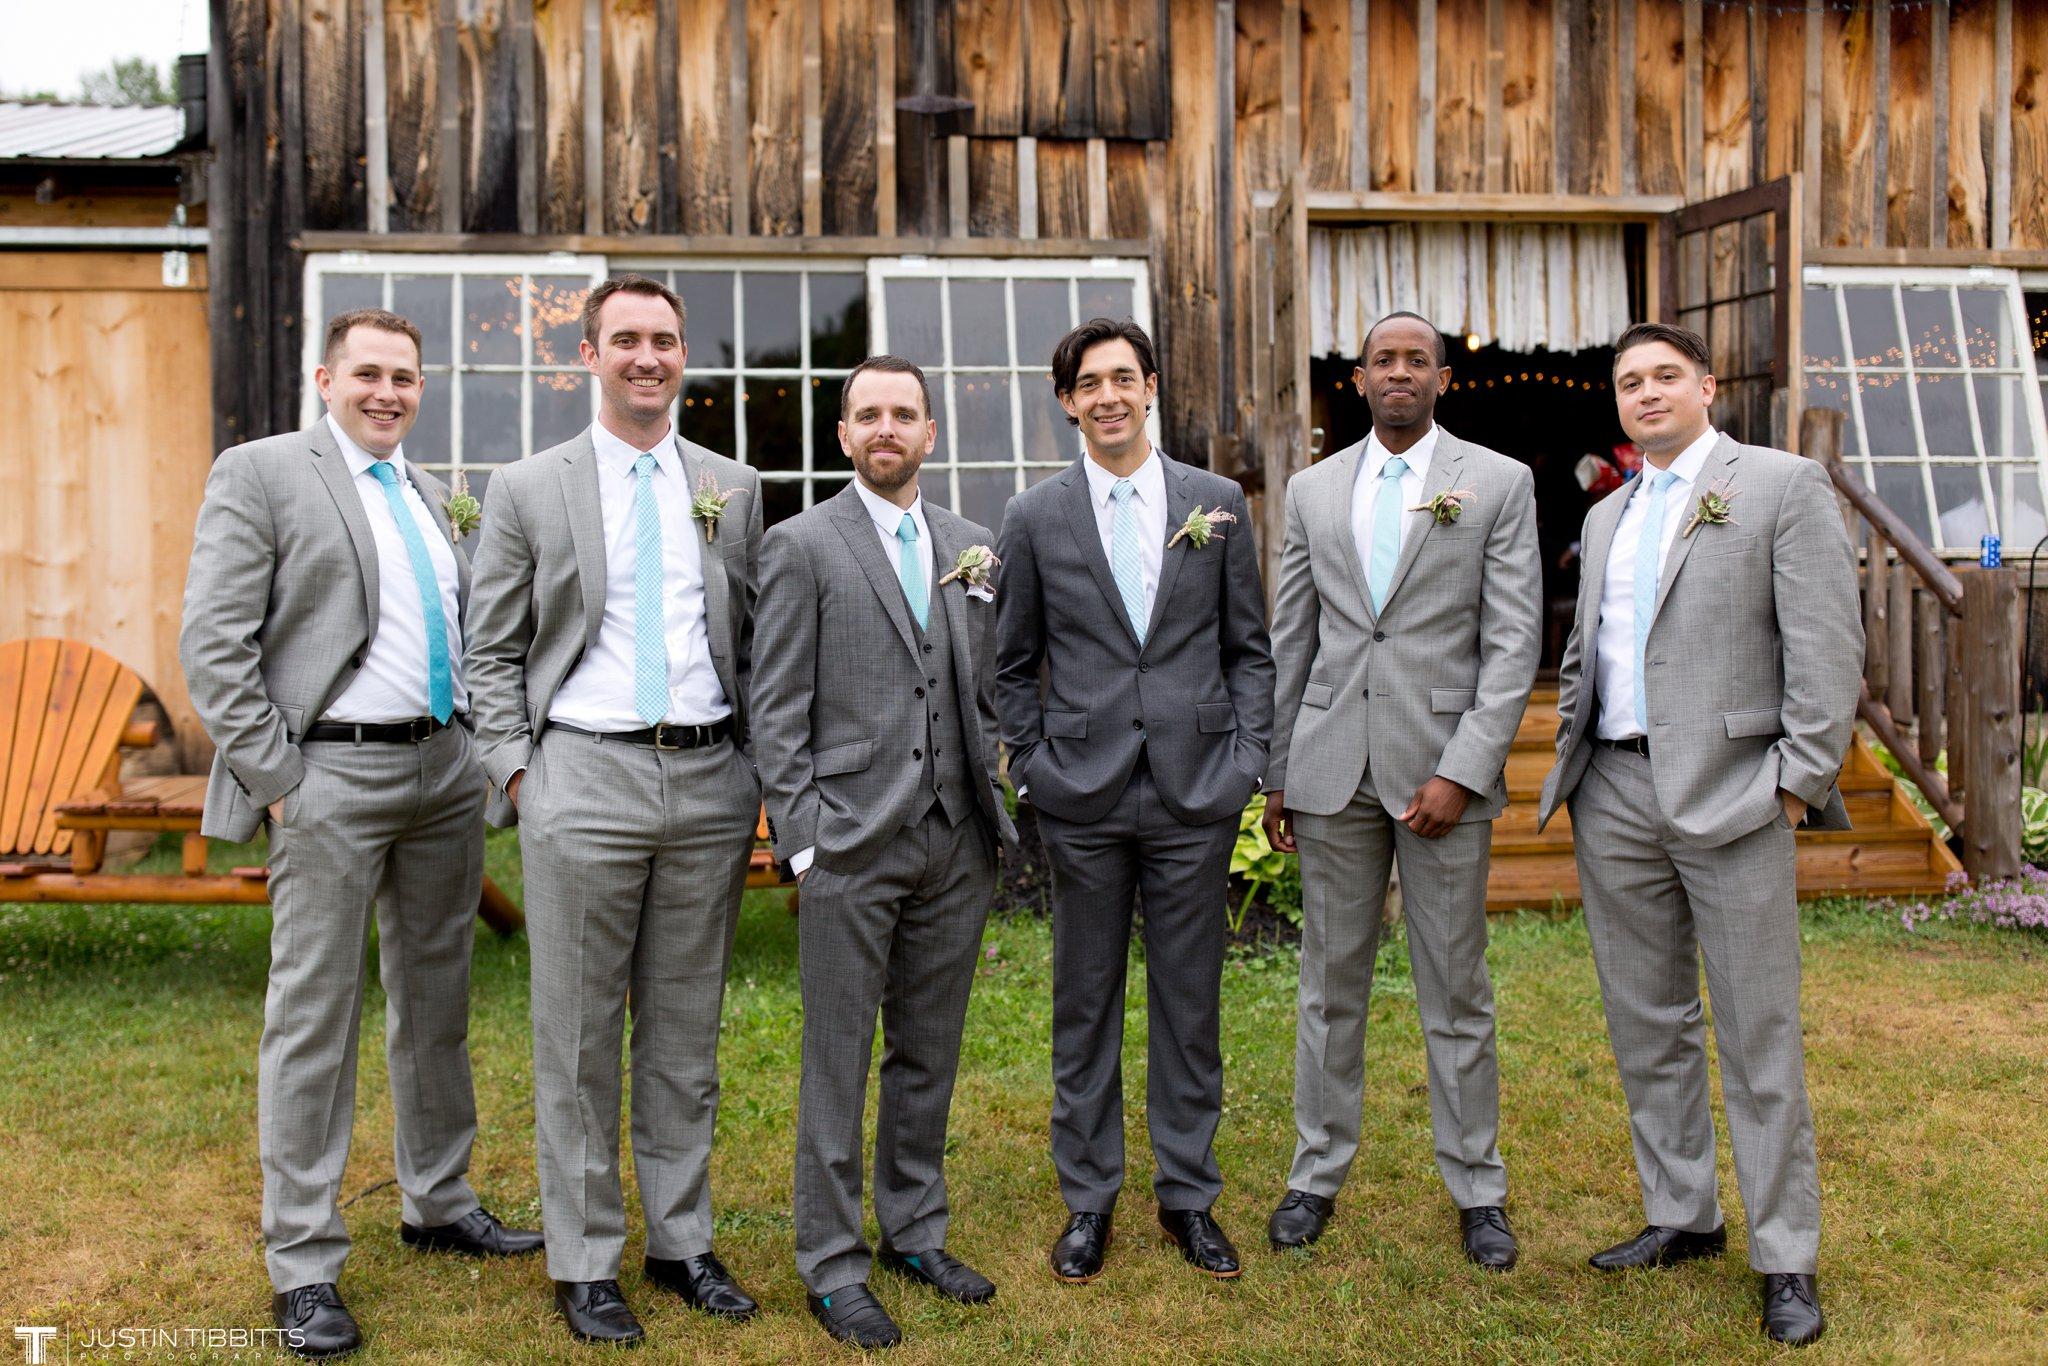 burlap-and-beams-wedding-photos-with-joran-and-molly_0044